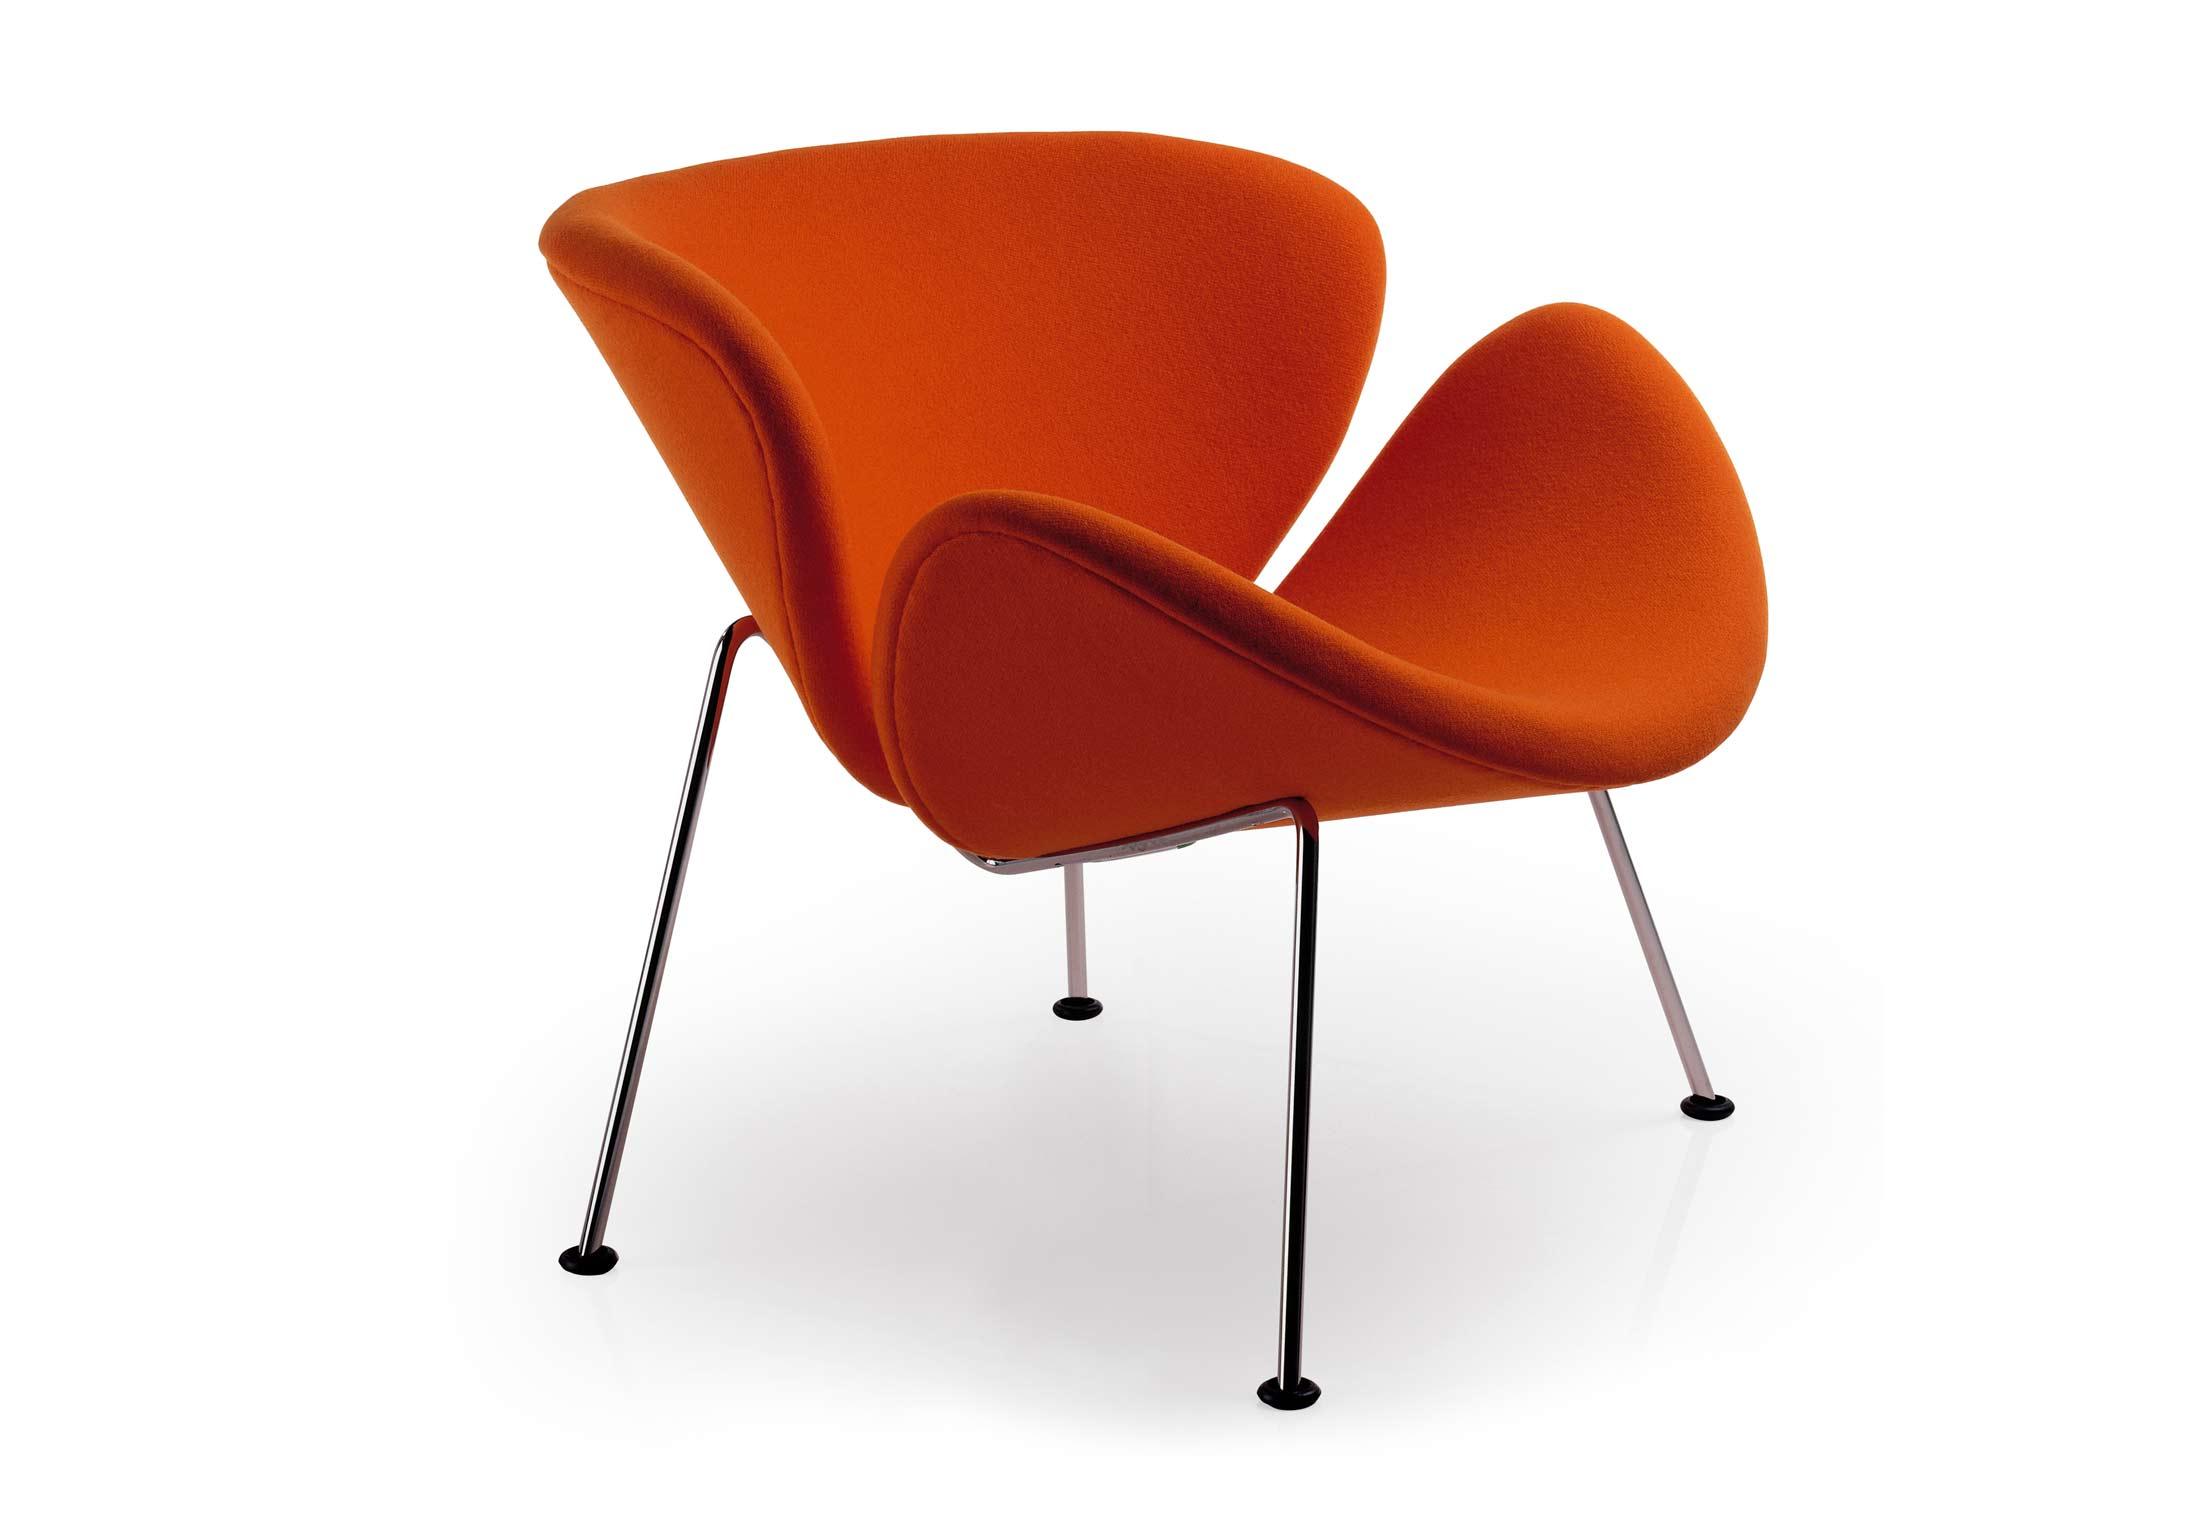 Ordinaire ... Orange Slice Chair F437/B ...